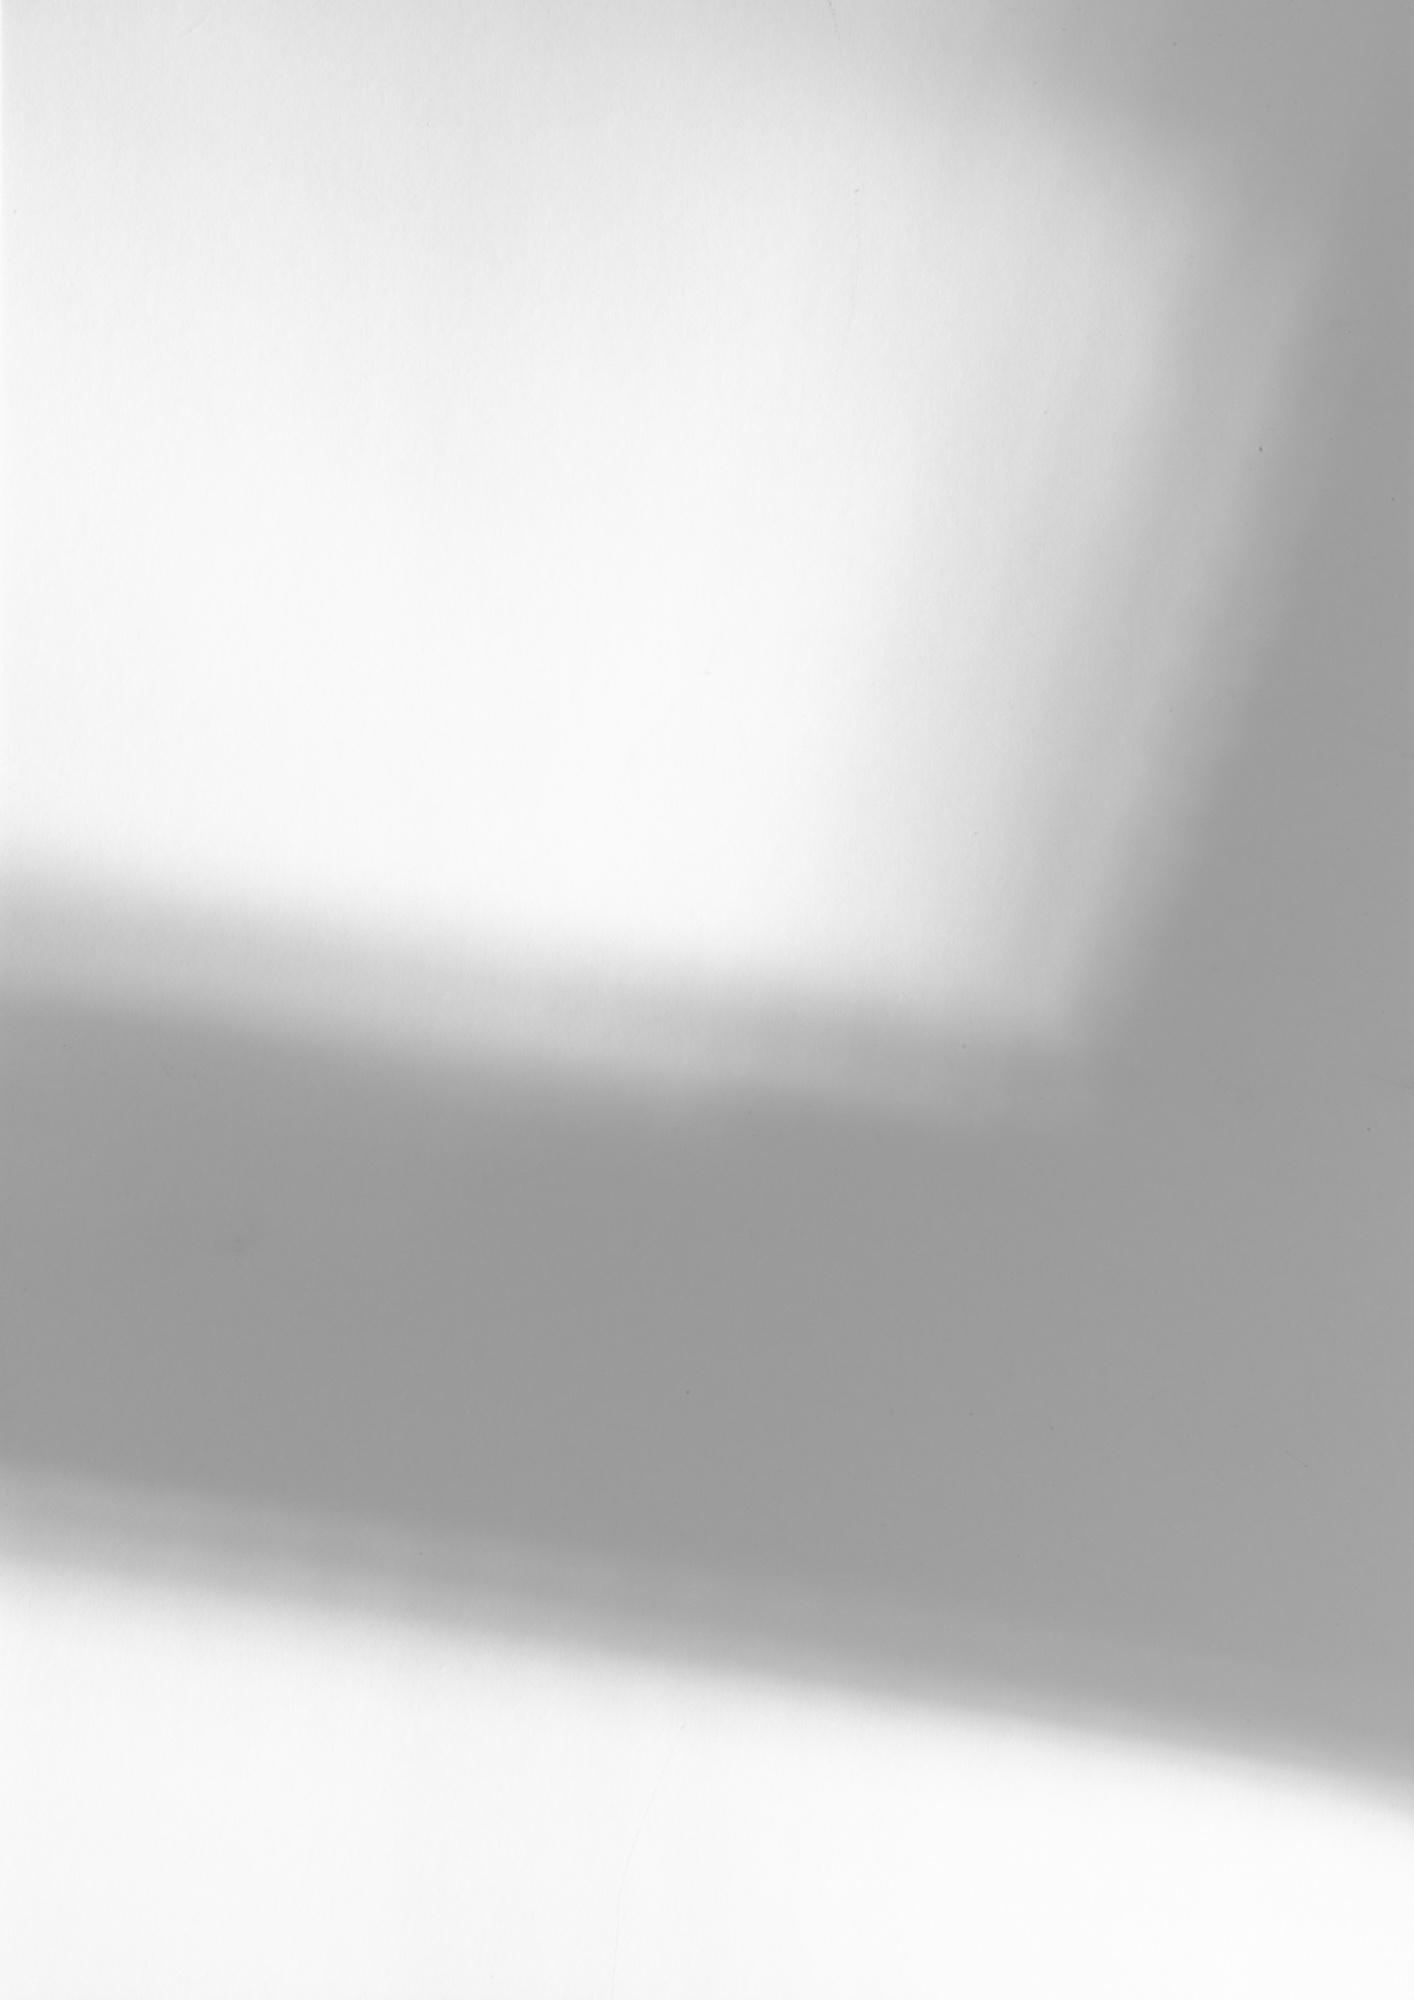 L1010141.jpg